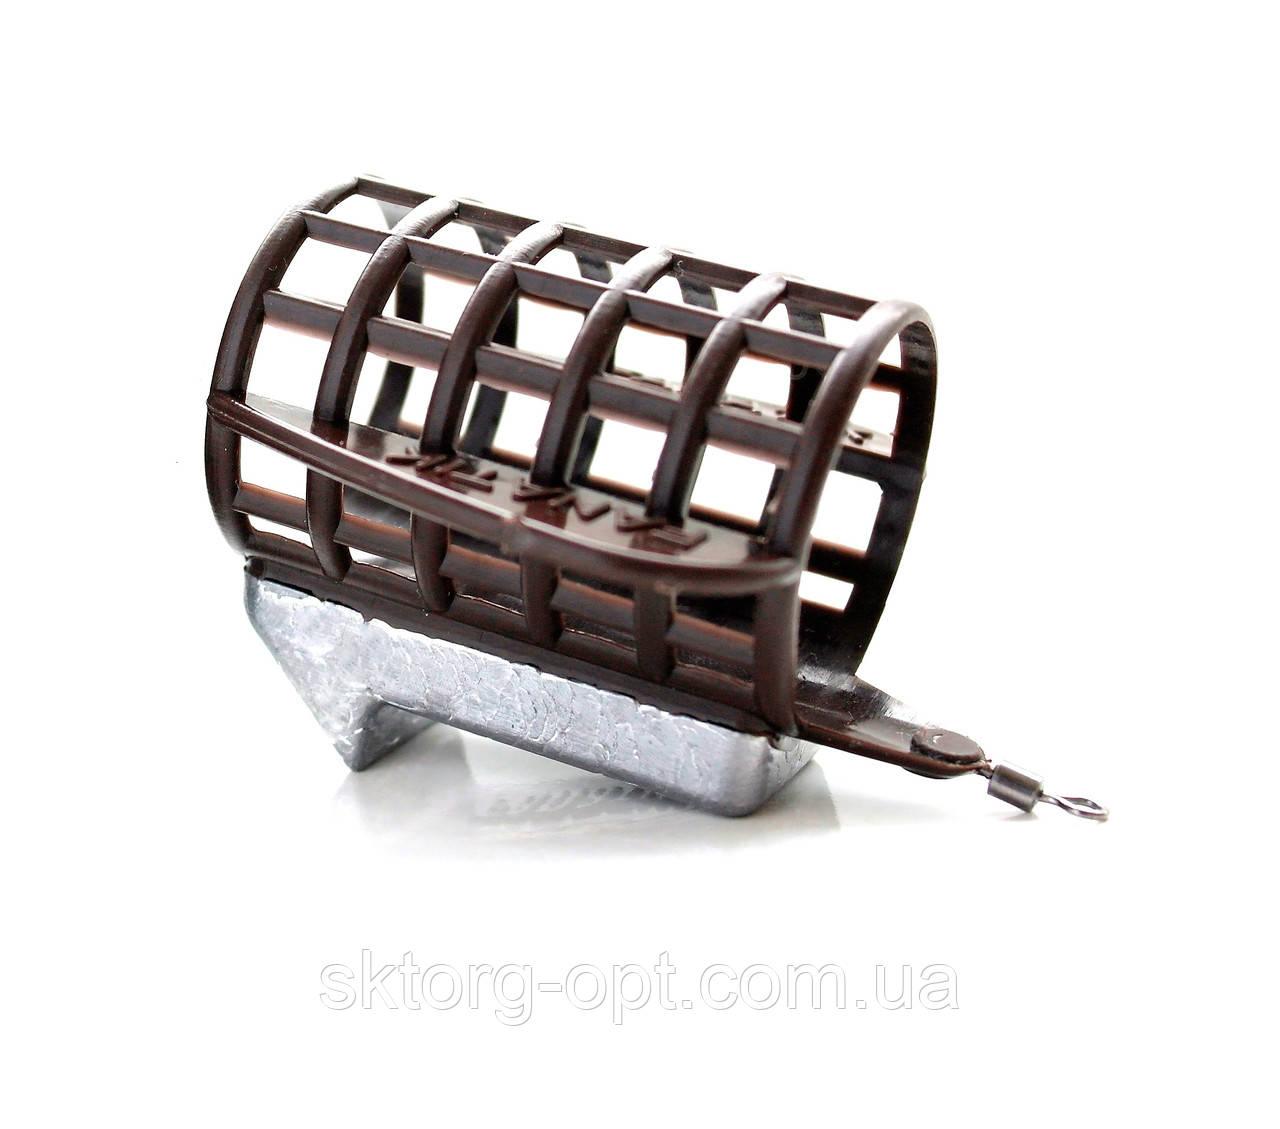 Кормушка фидерная Fanatik ХАПУГА, вес 50 гр